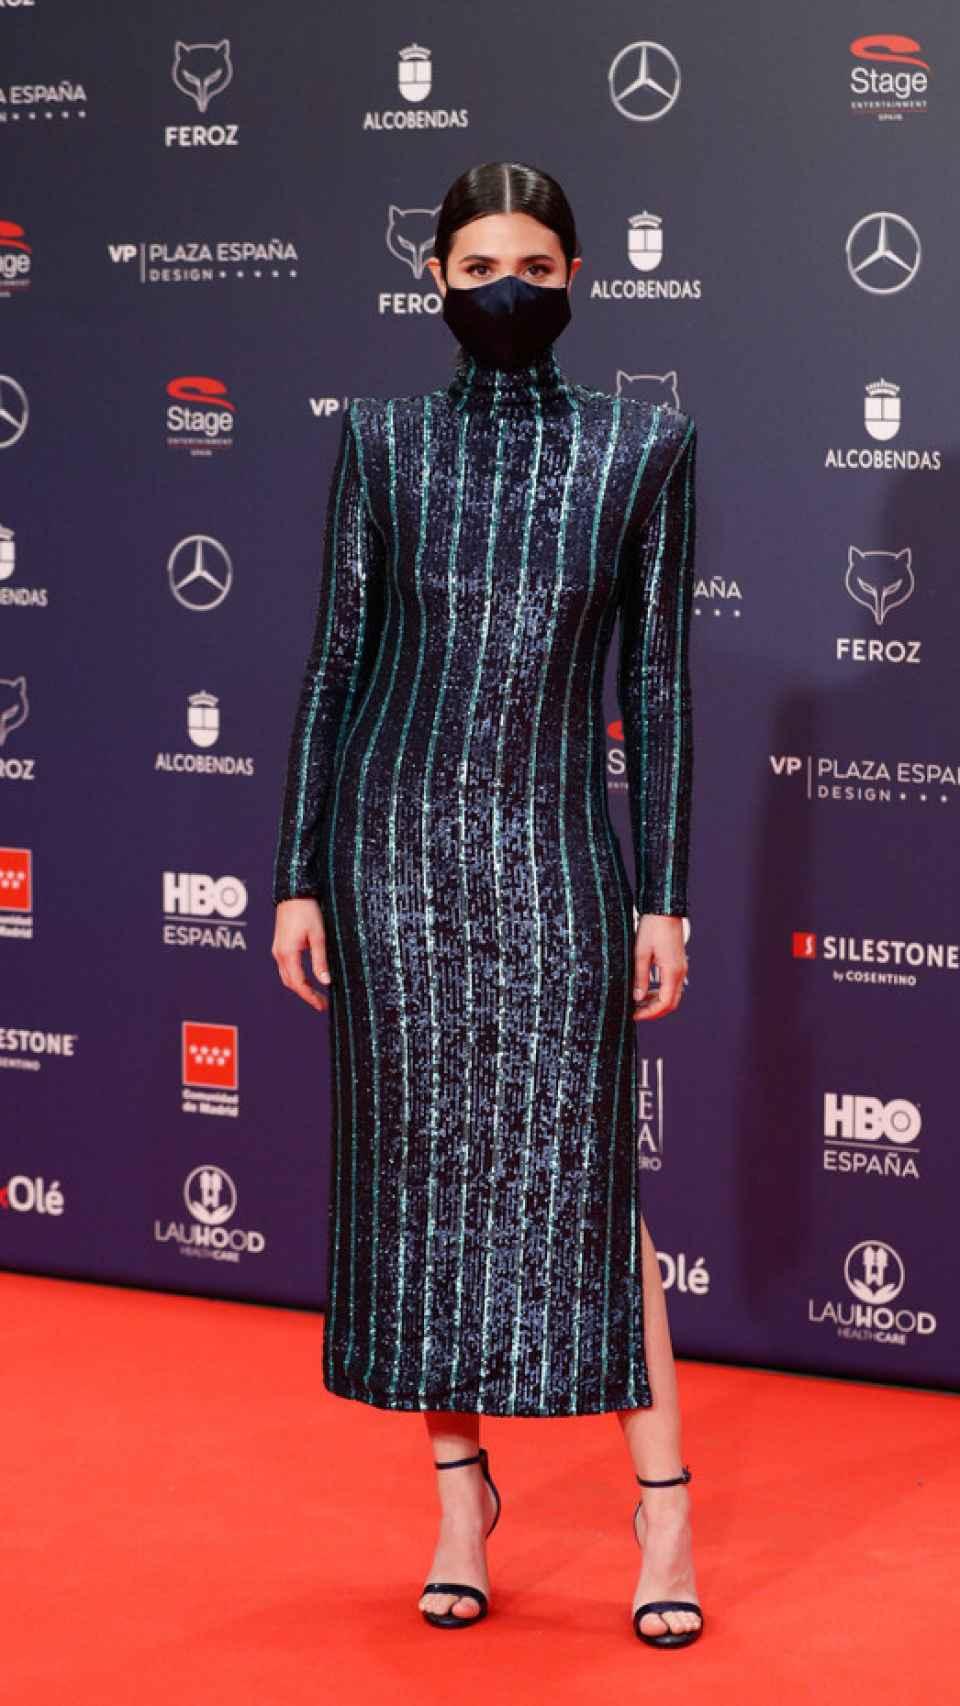 Loreto Mauleón posed with the signature dress at the Feroz Awards.